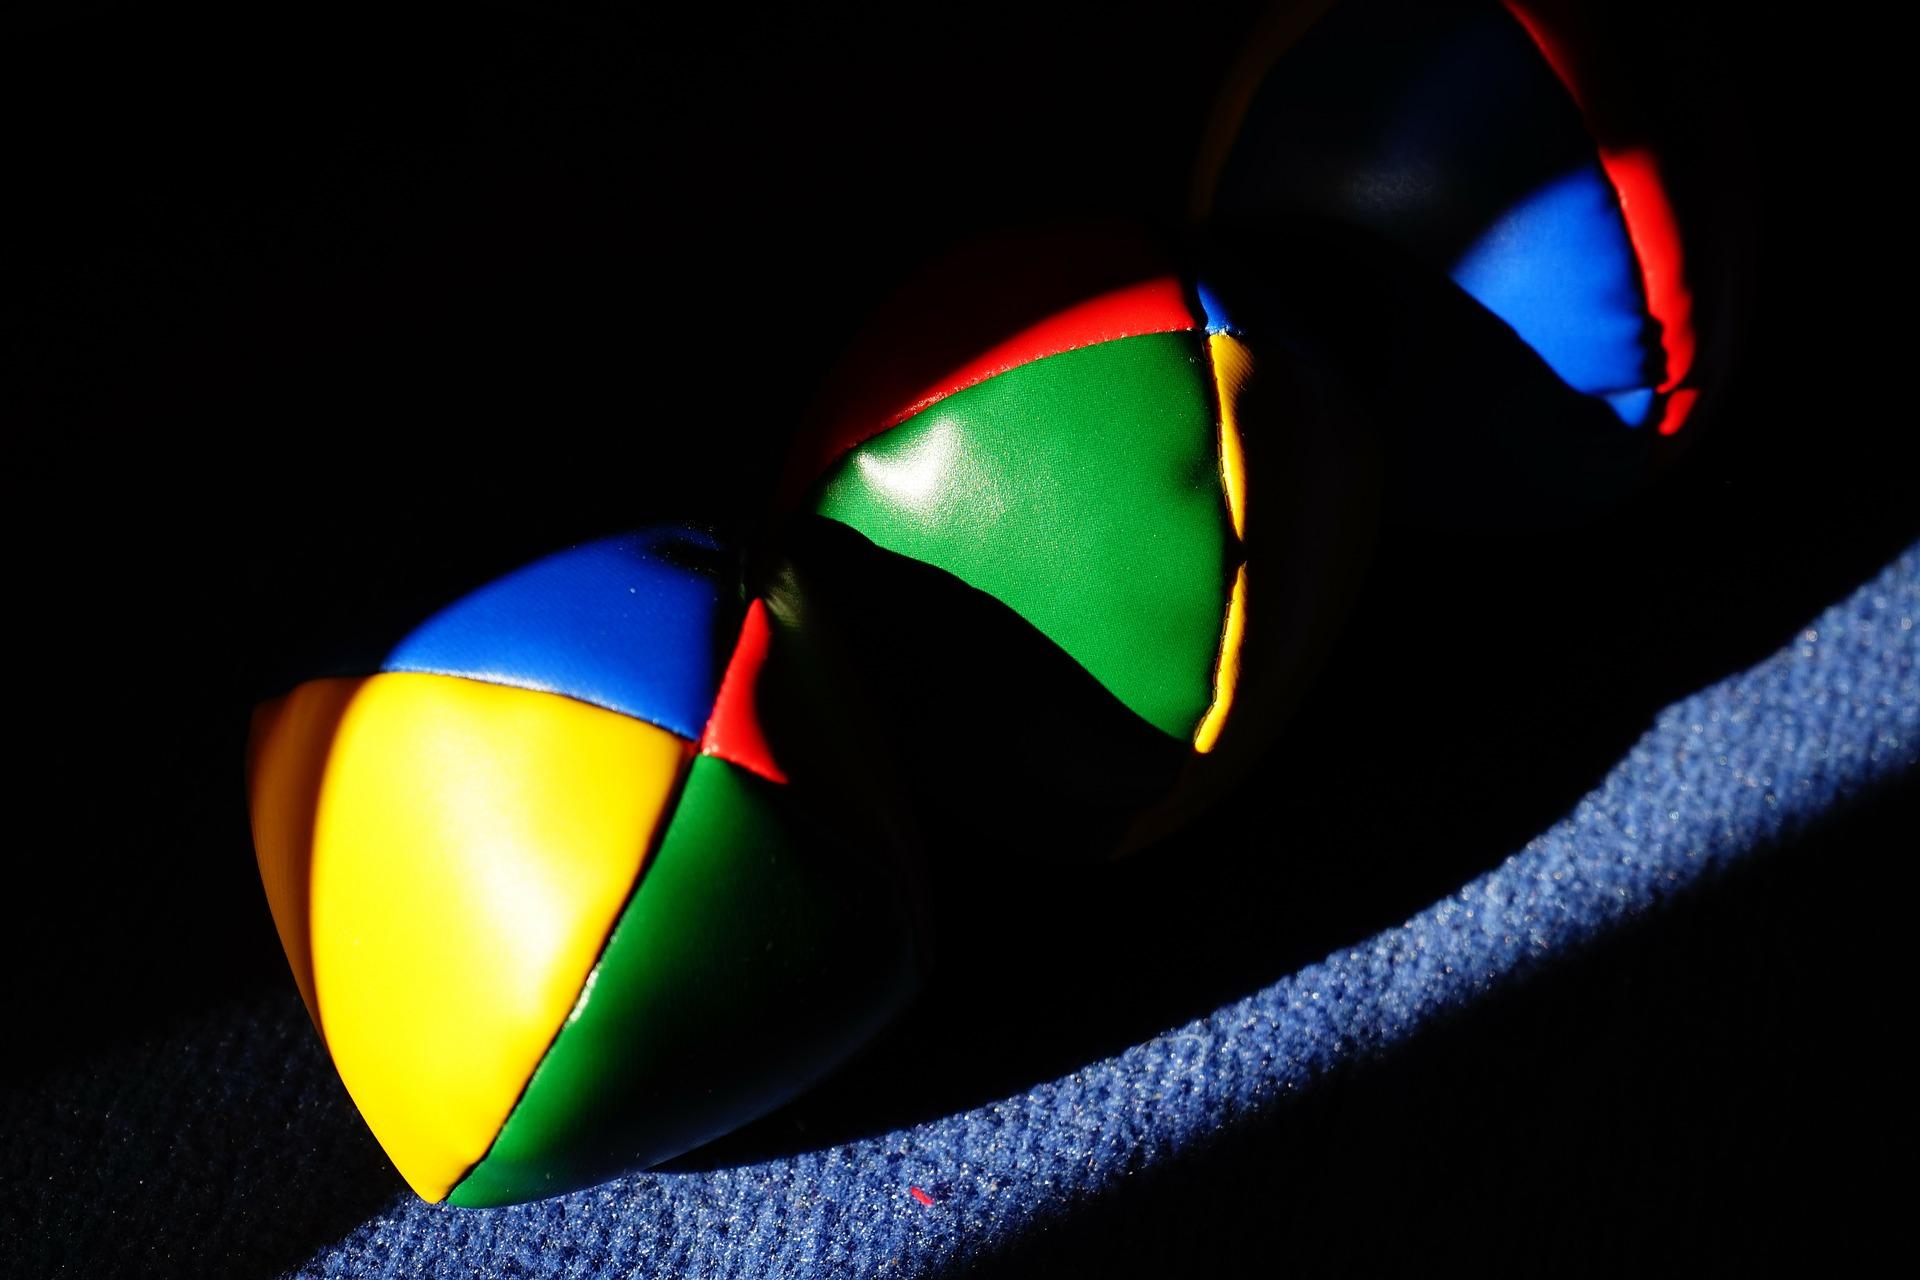 balls-272407_1920